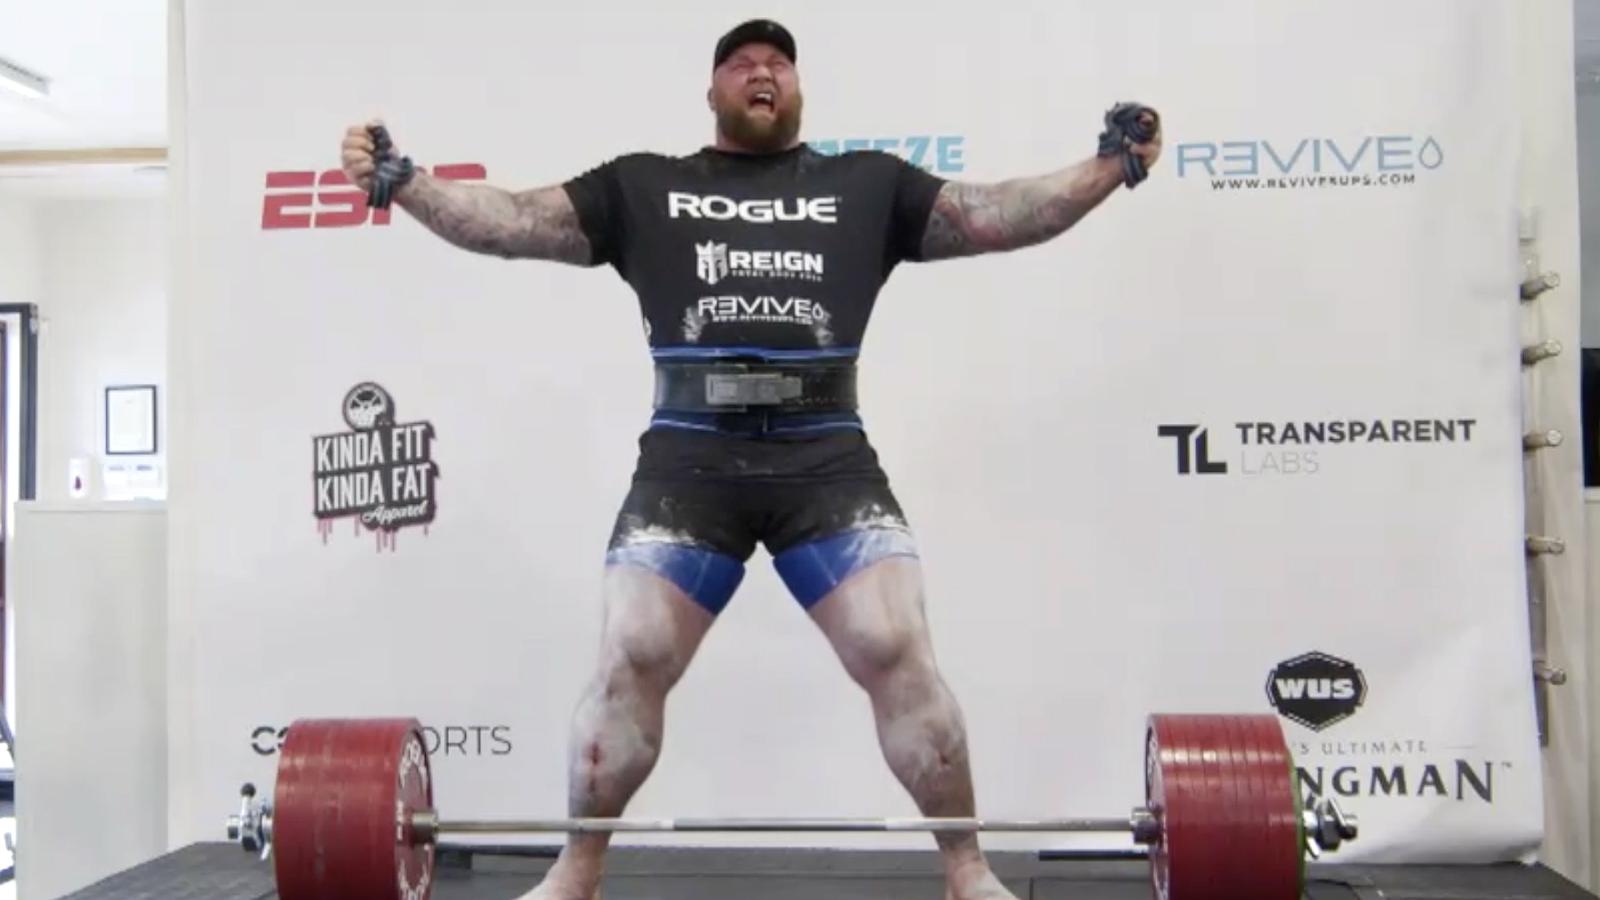 Hafthor Bjornsson celebrating his deadlift world record.